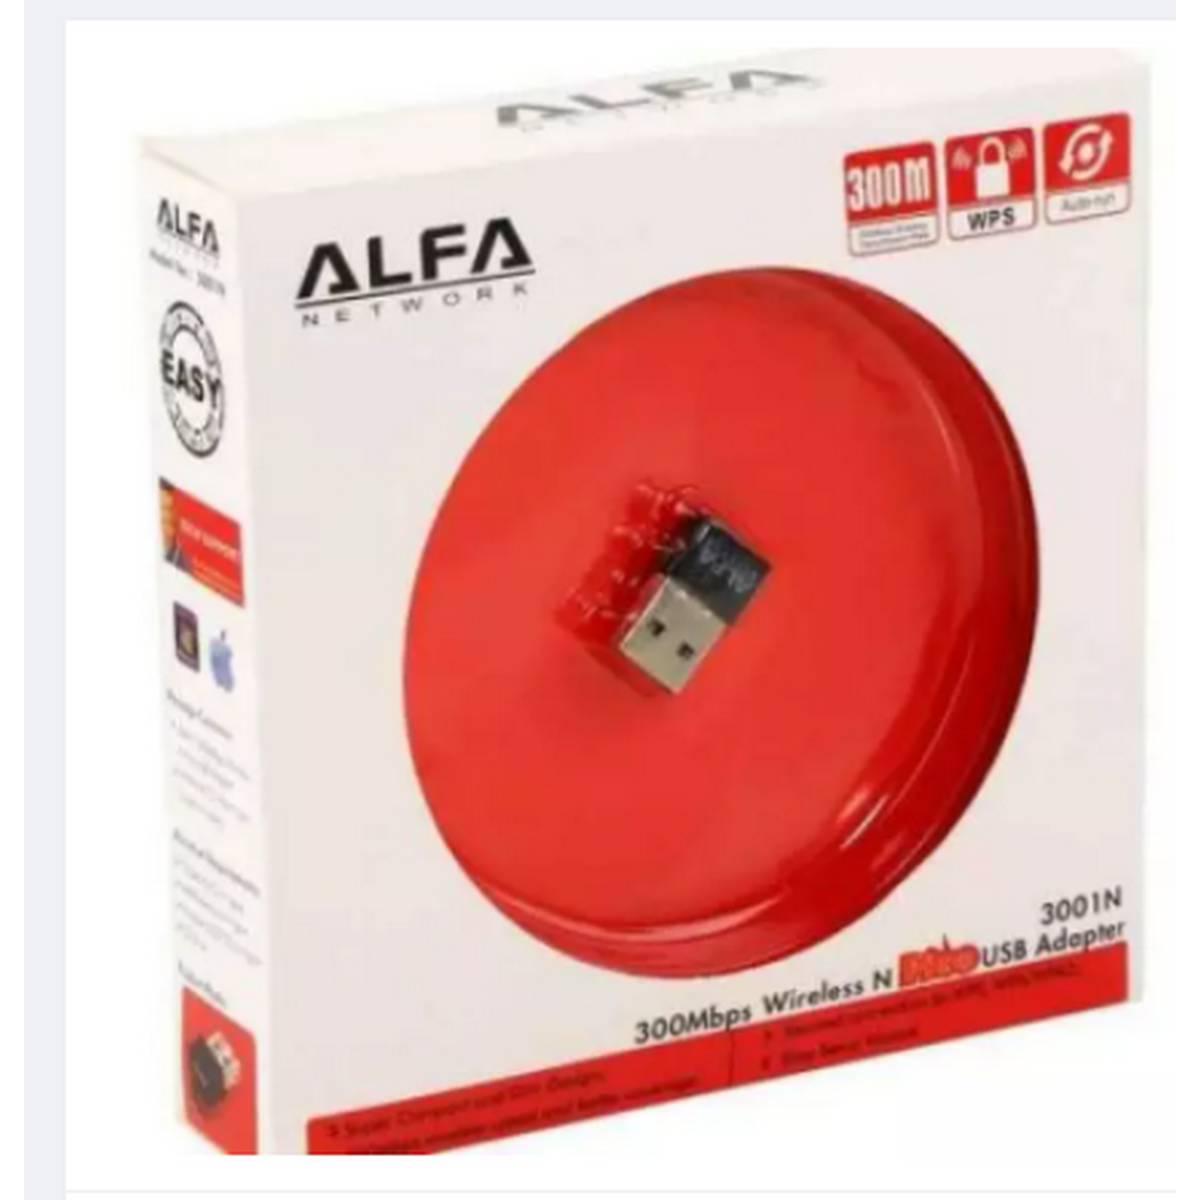 USB ALFA Mini Wireless Wifi Adapter Dongle Receiver Network LAN Card PC 150Mbps USB 2.0 Wireless Network Card